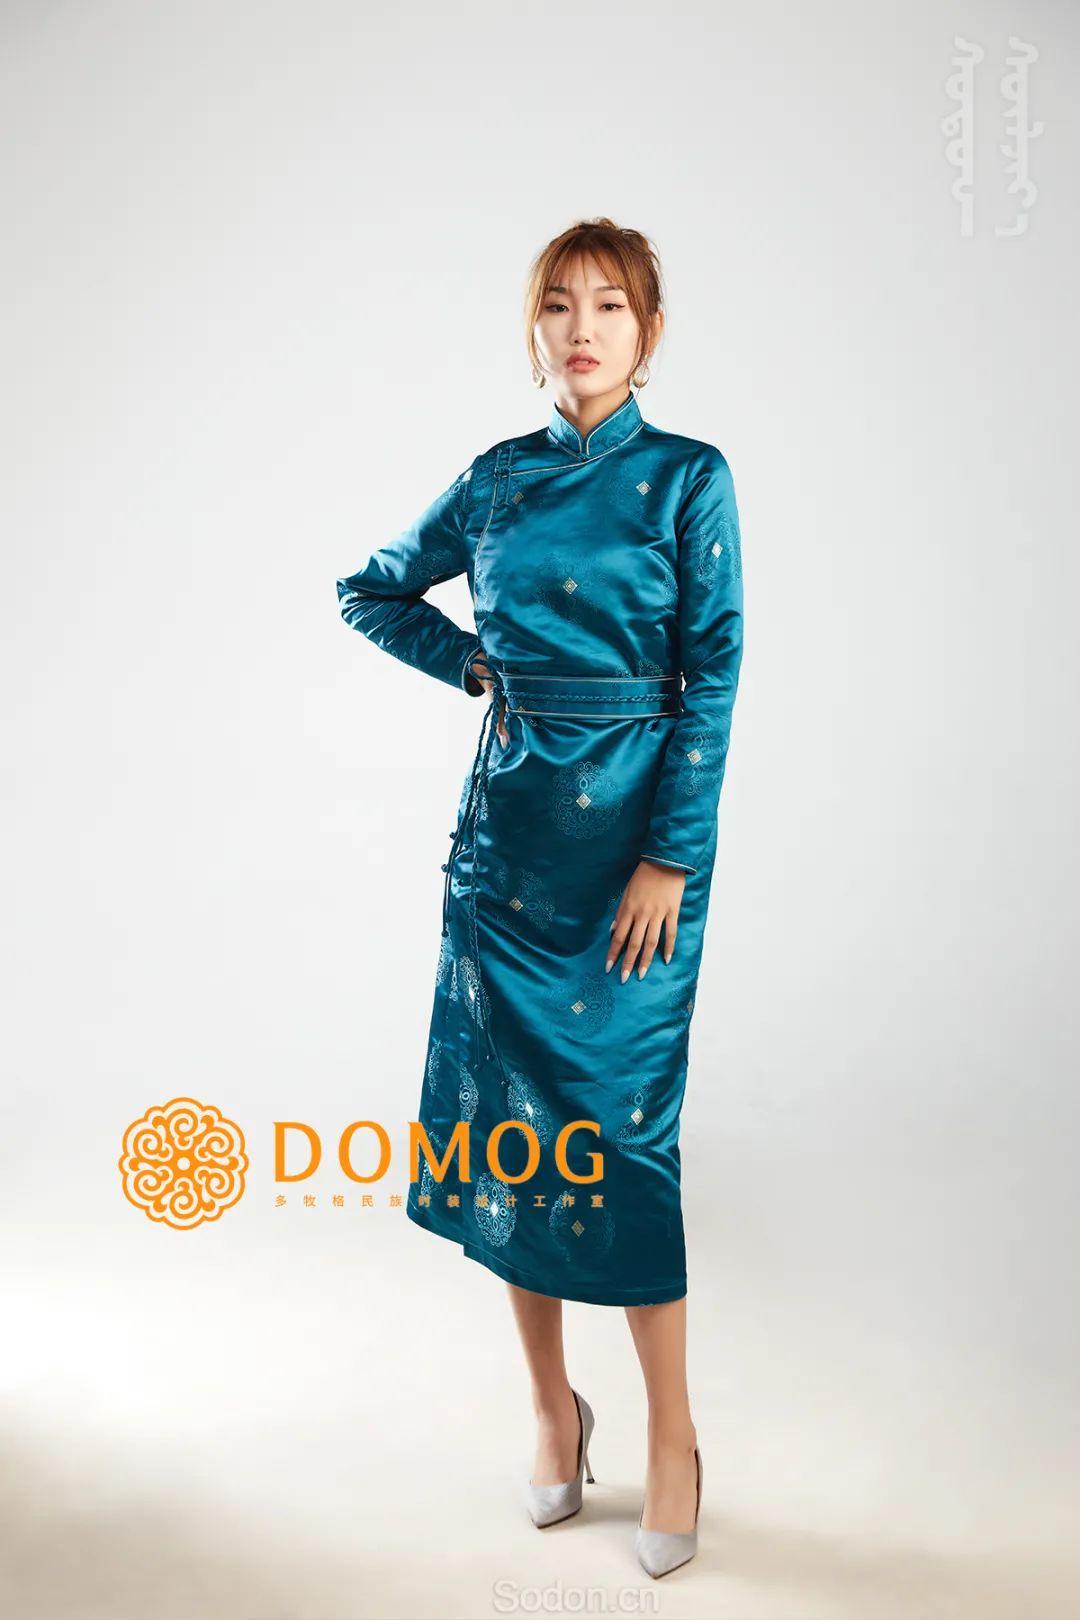 DOMOG 蒙古时装2020新款,民族与时尚的融合 第10张 DOMOG 蒙古时装2020新款,民族与时尚的融合 蒙古服饰